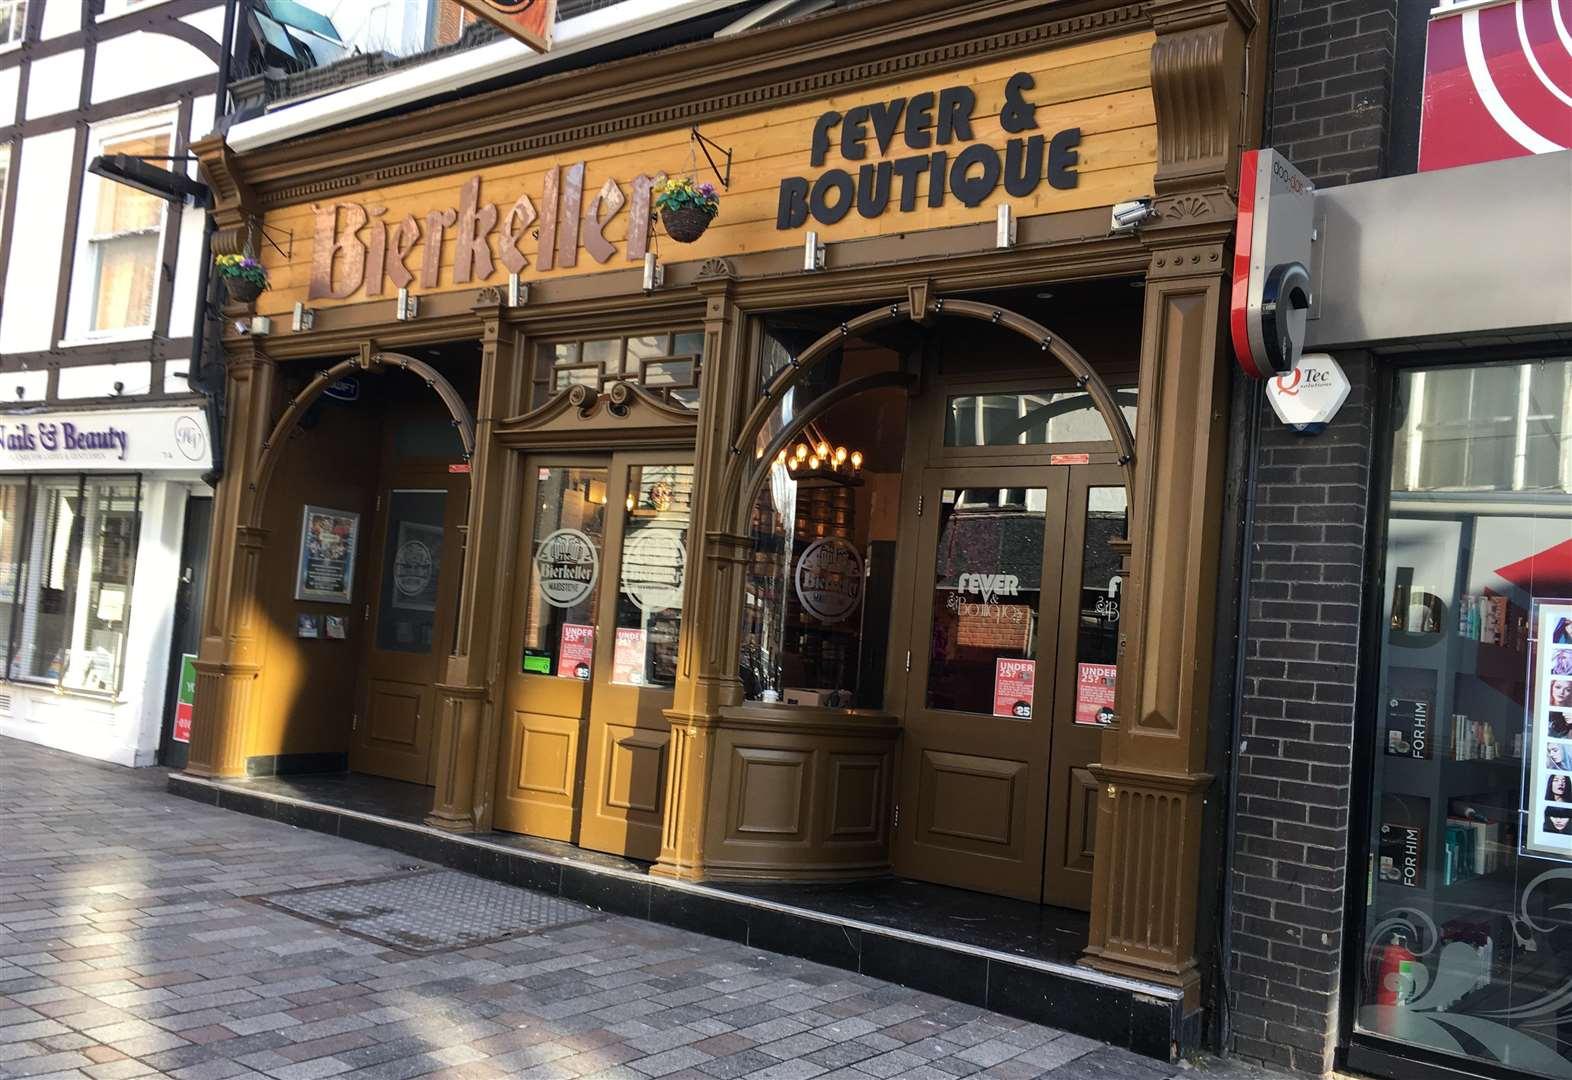 Maidstone Bierkeller Bar Faces Backlash Over Facebook Joke